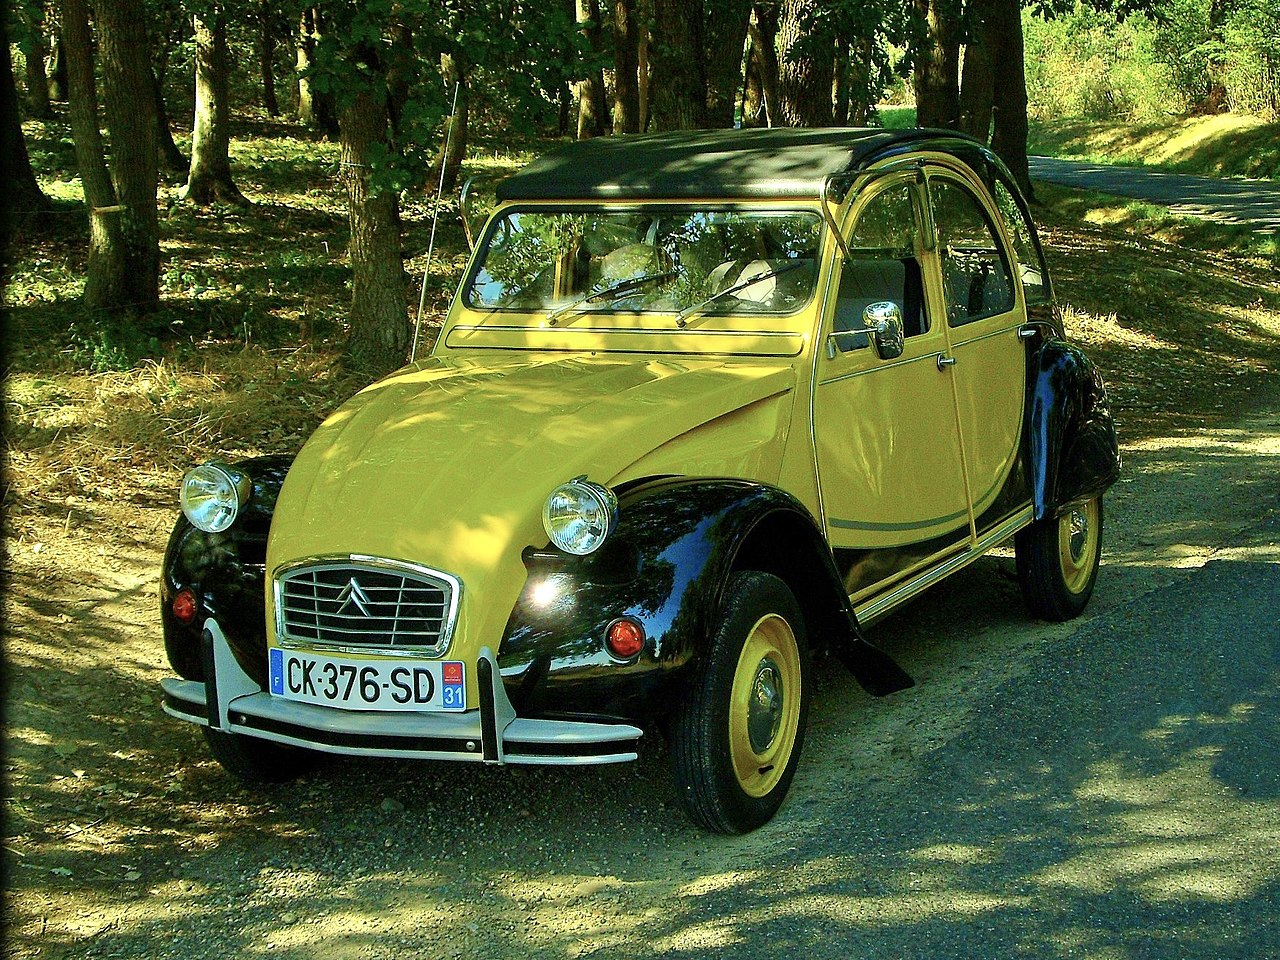 file 2cv citroen charleston jaune h u00e9lios et noir 1982 jpg